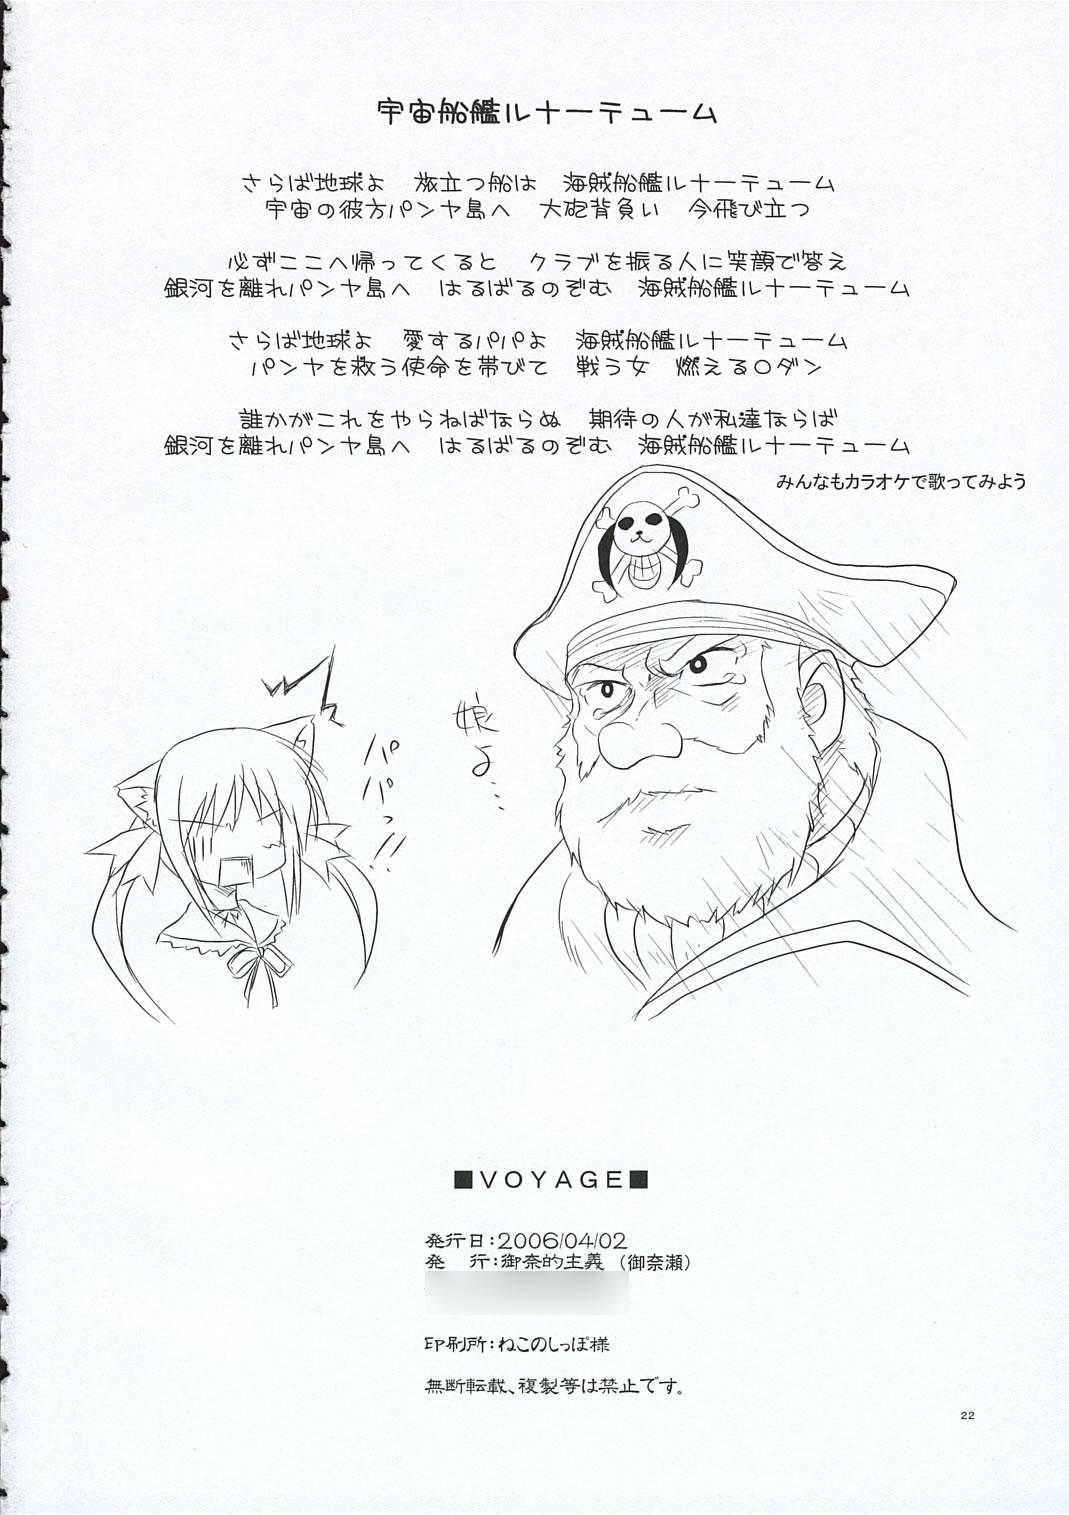 Minatekishugi] Voyage 20